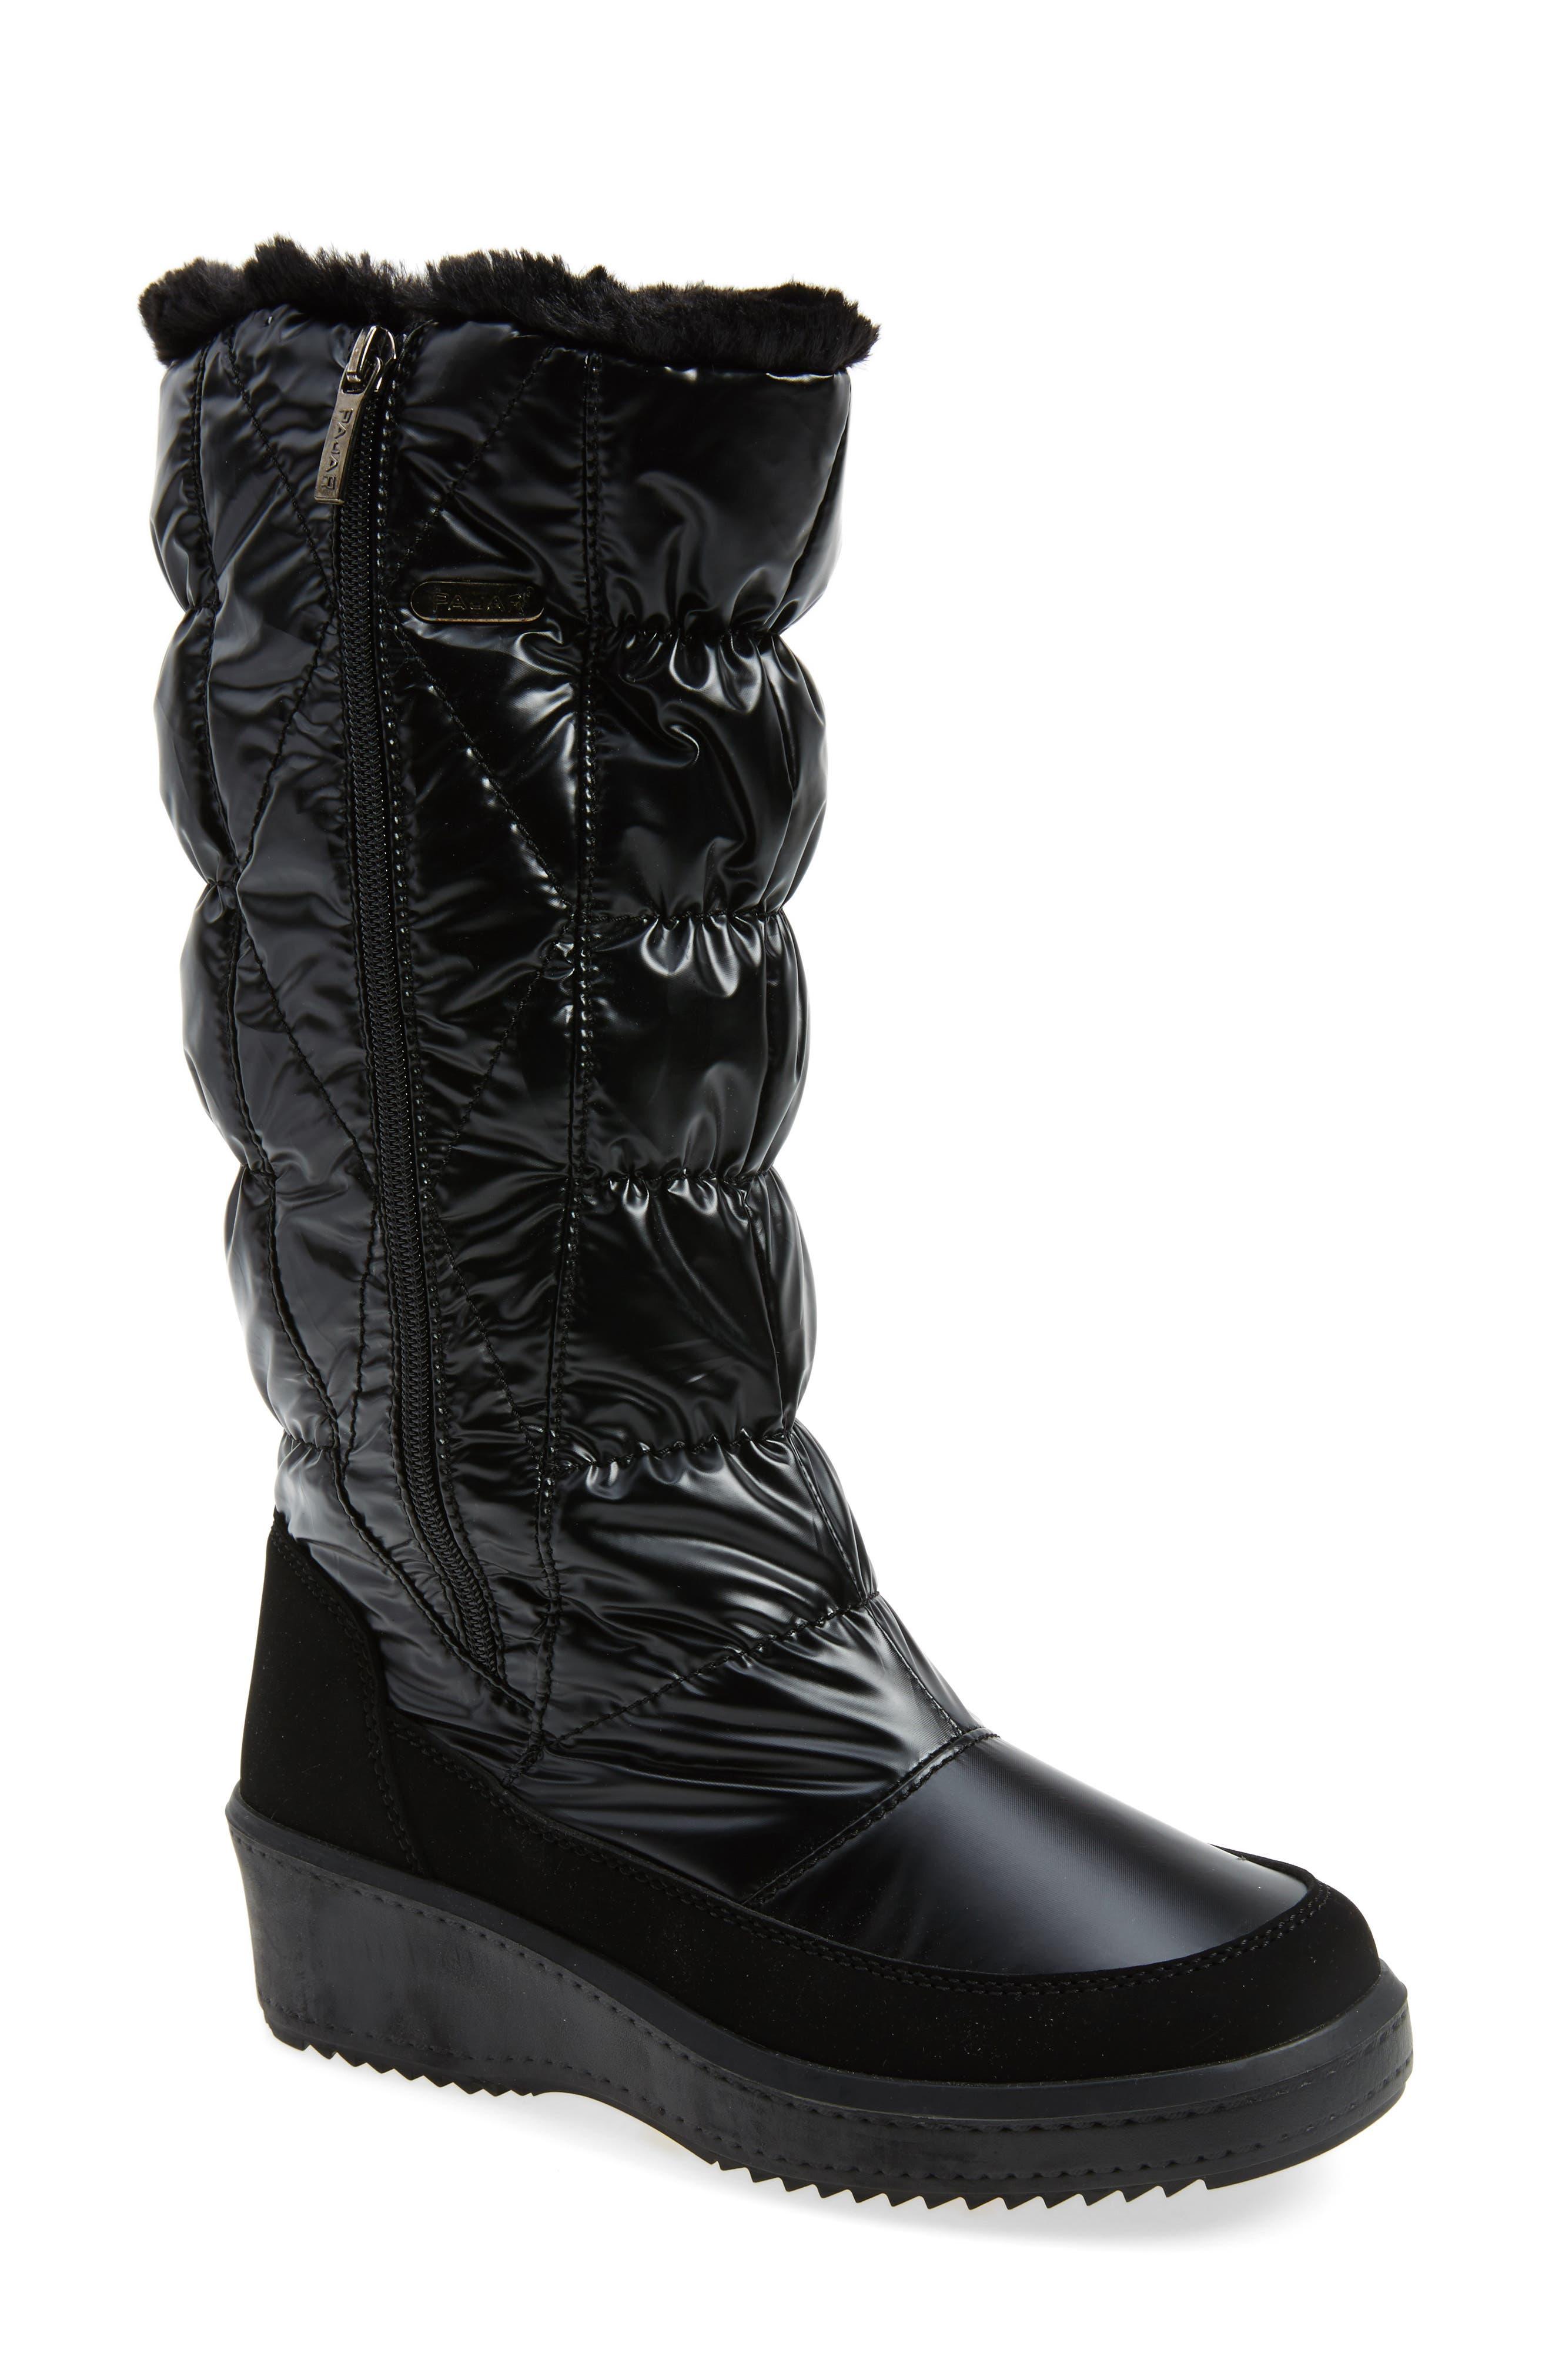 Alternate Image 1 Selected - Pajar 'Alexandra' Waterproof Boot (Women)